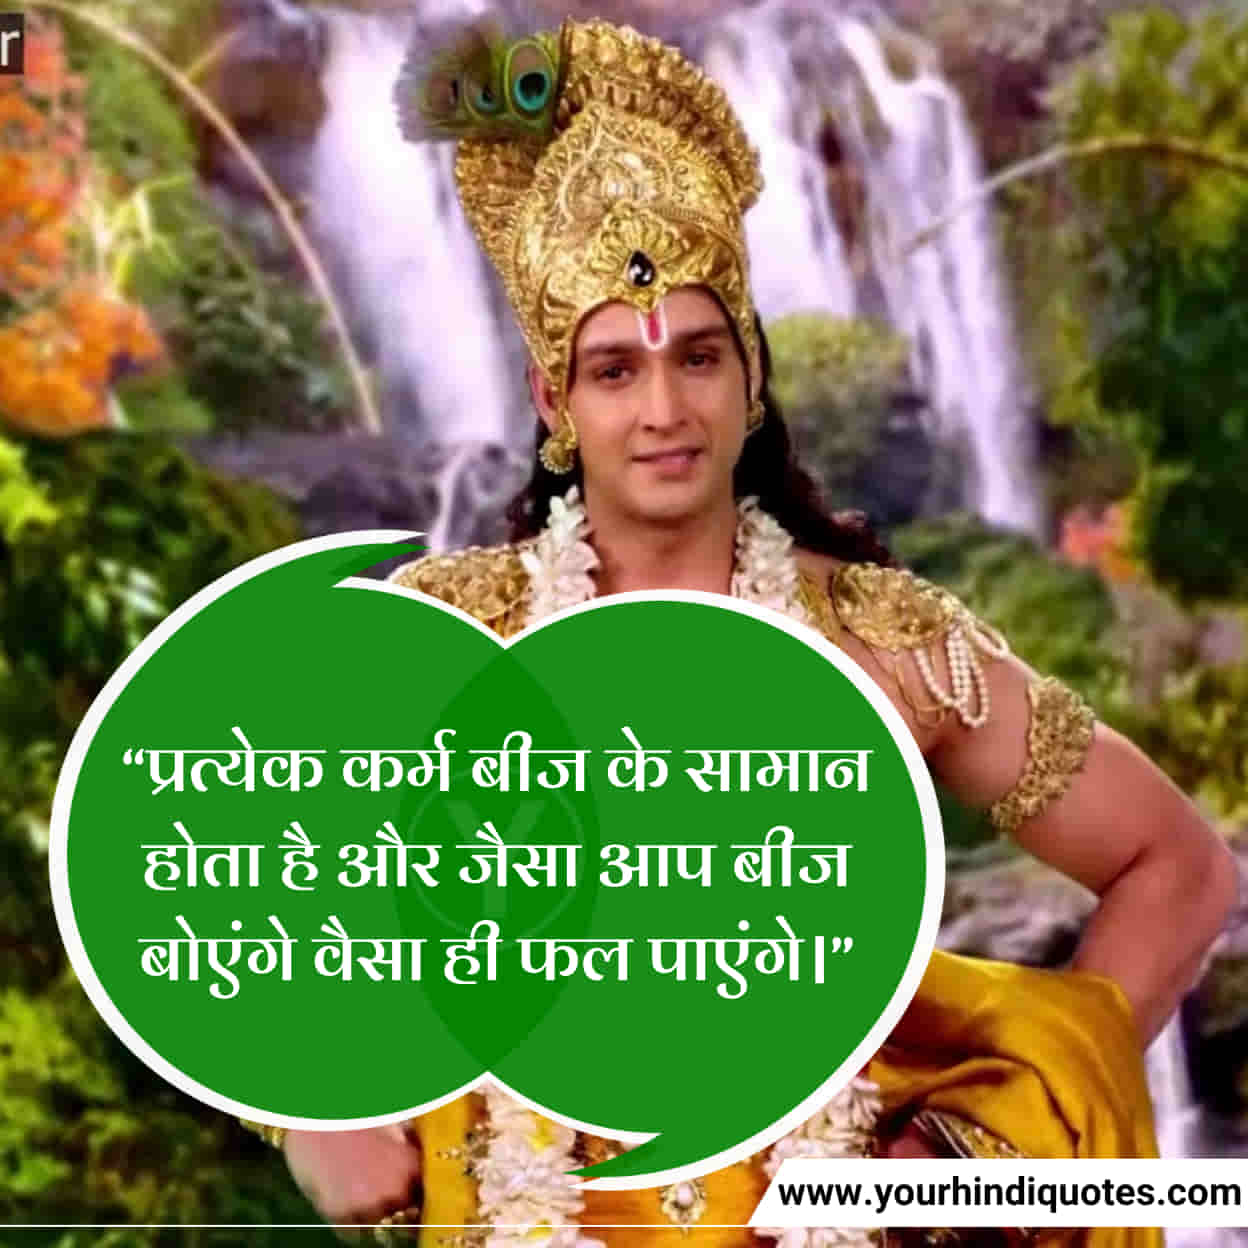 Motivational Karma Quotes In Hindi